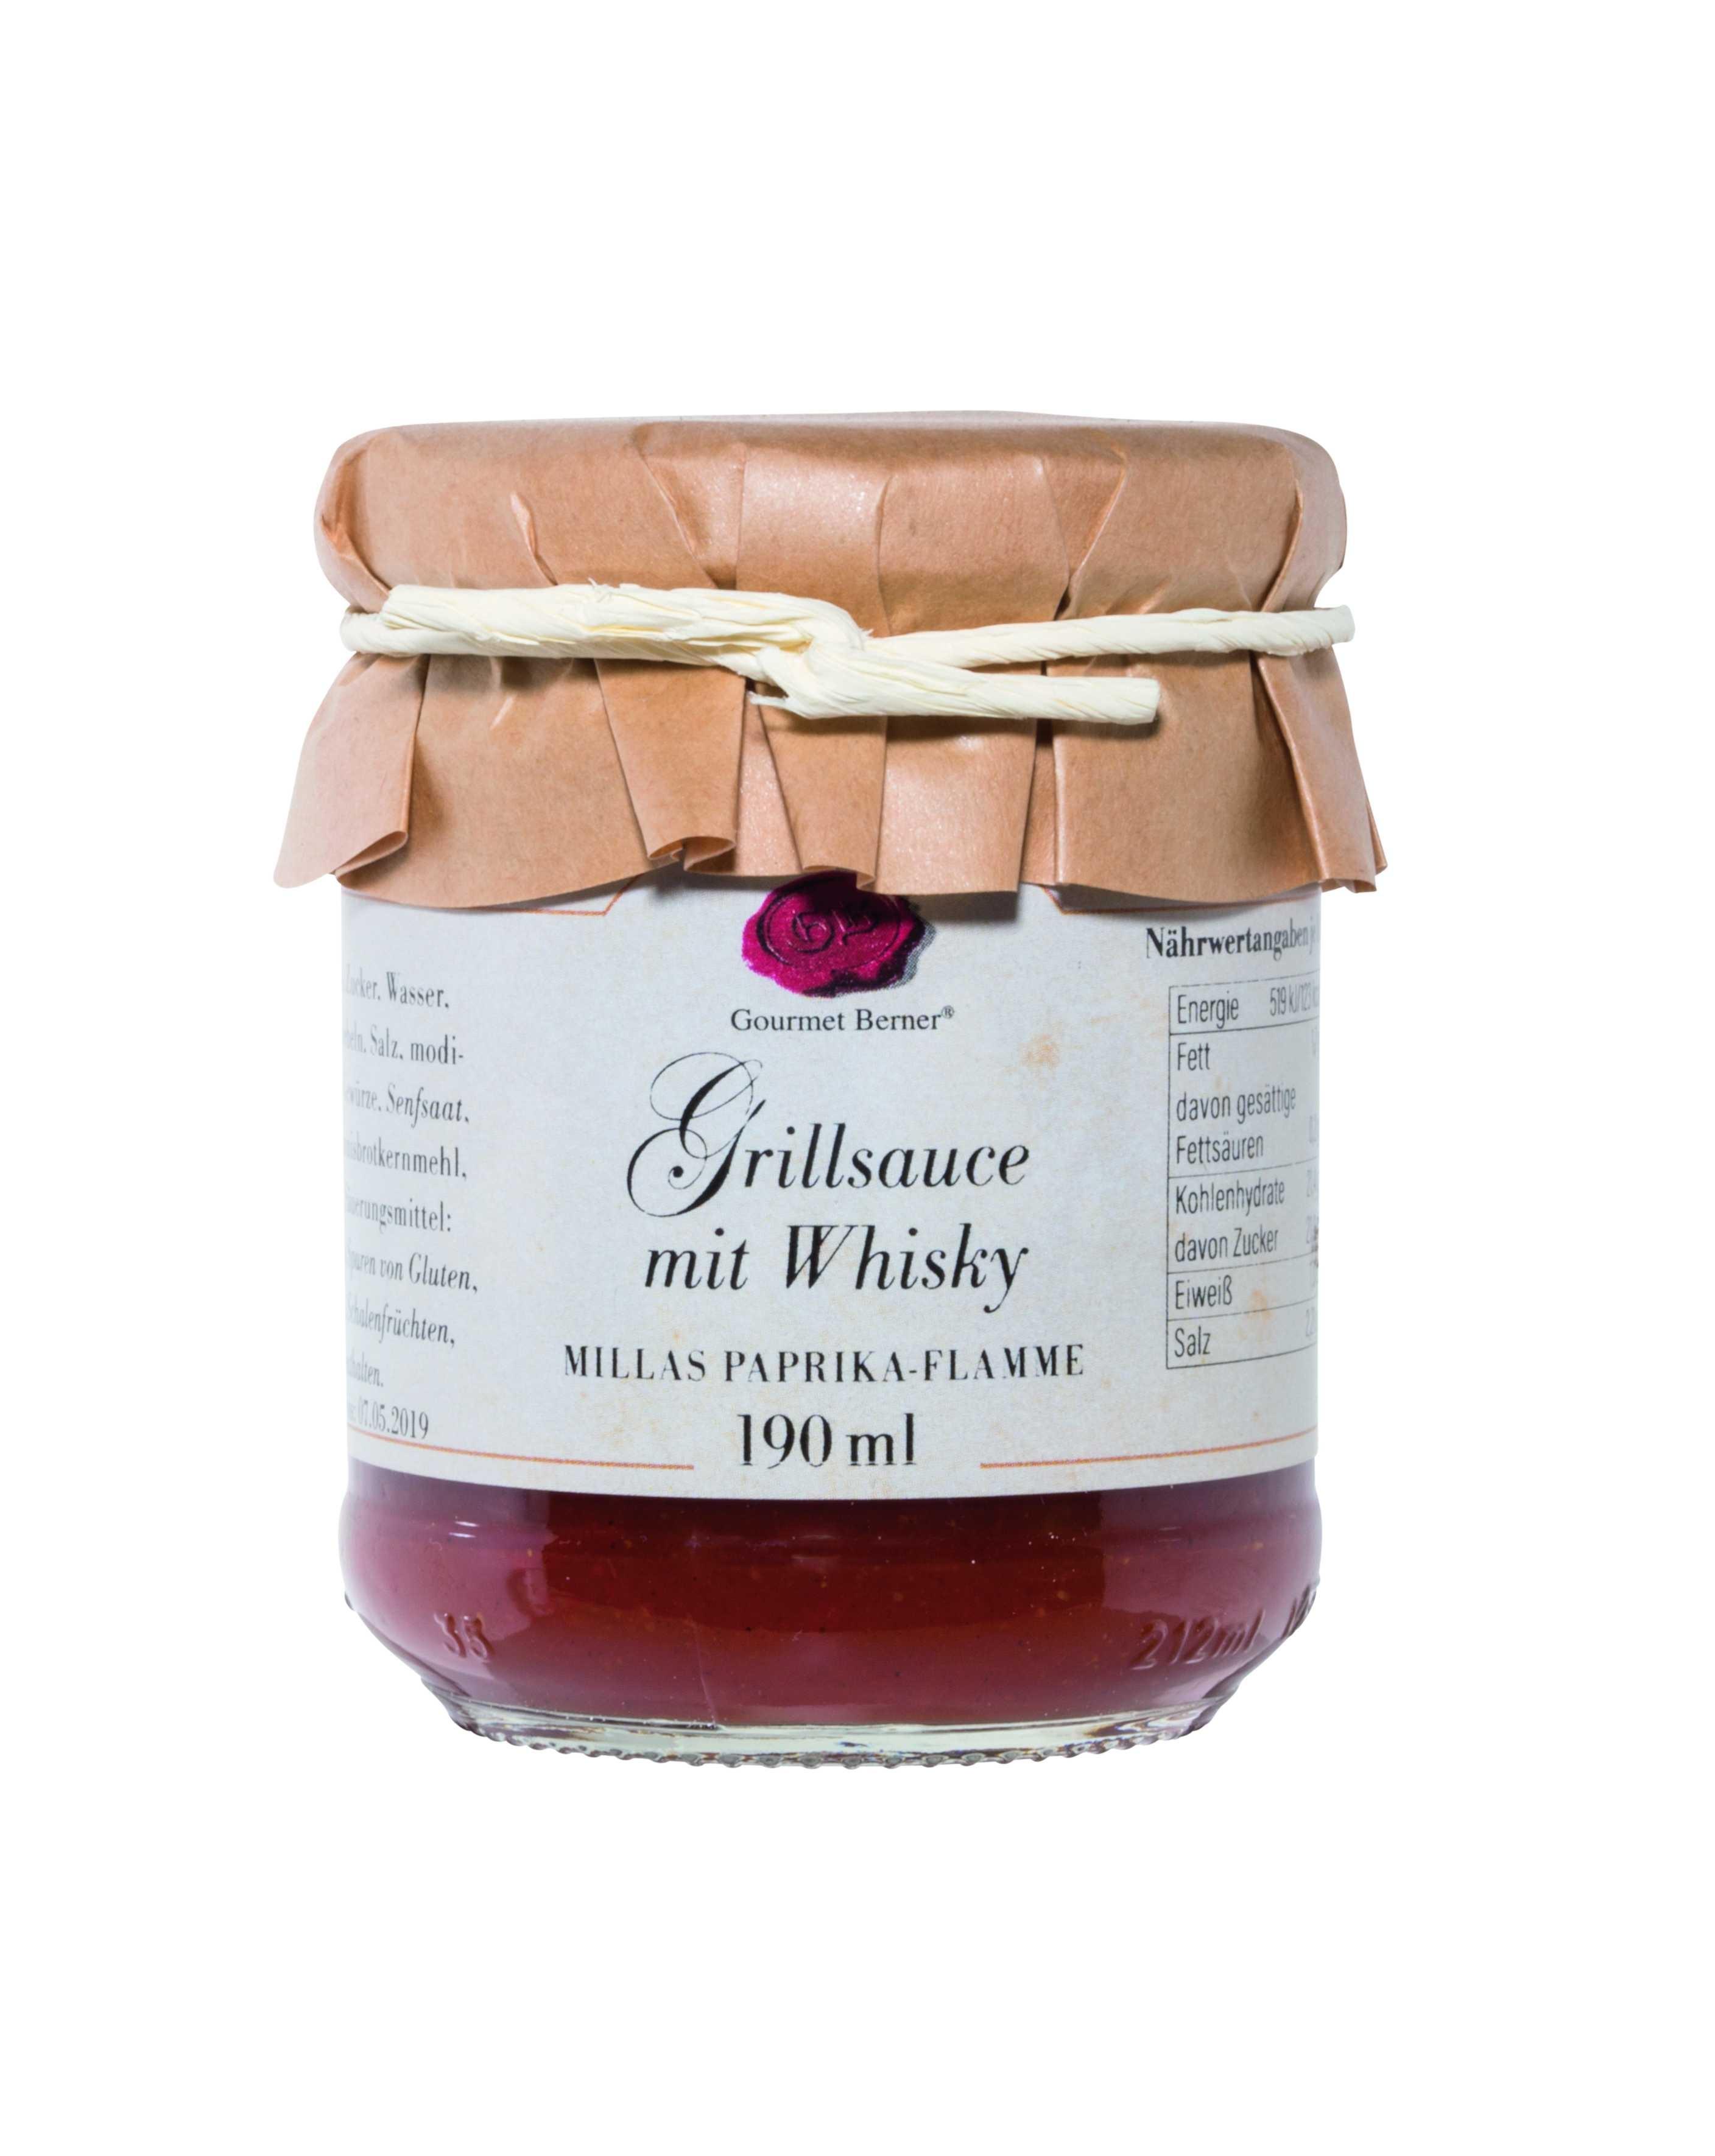 Grillsauce mit Whisky (Millas Paprika-Flamme Grillsauce), 190ml Glas